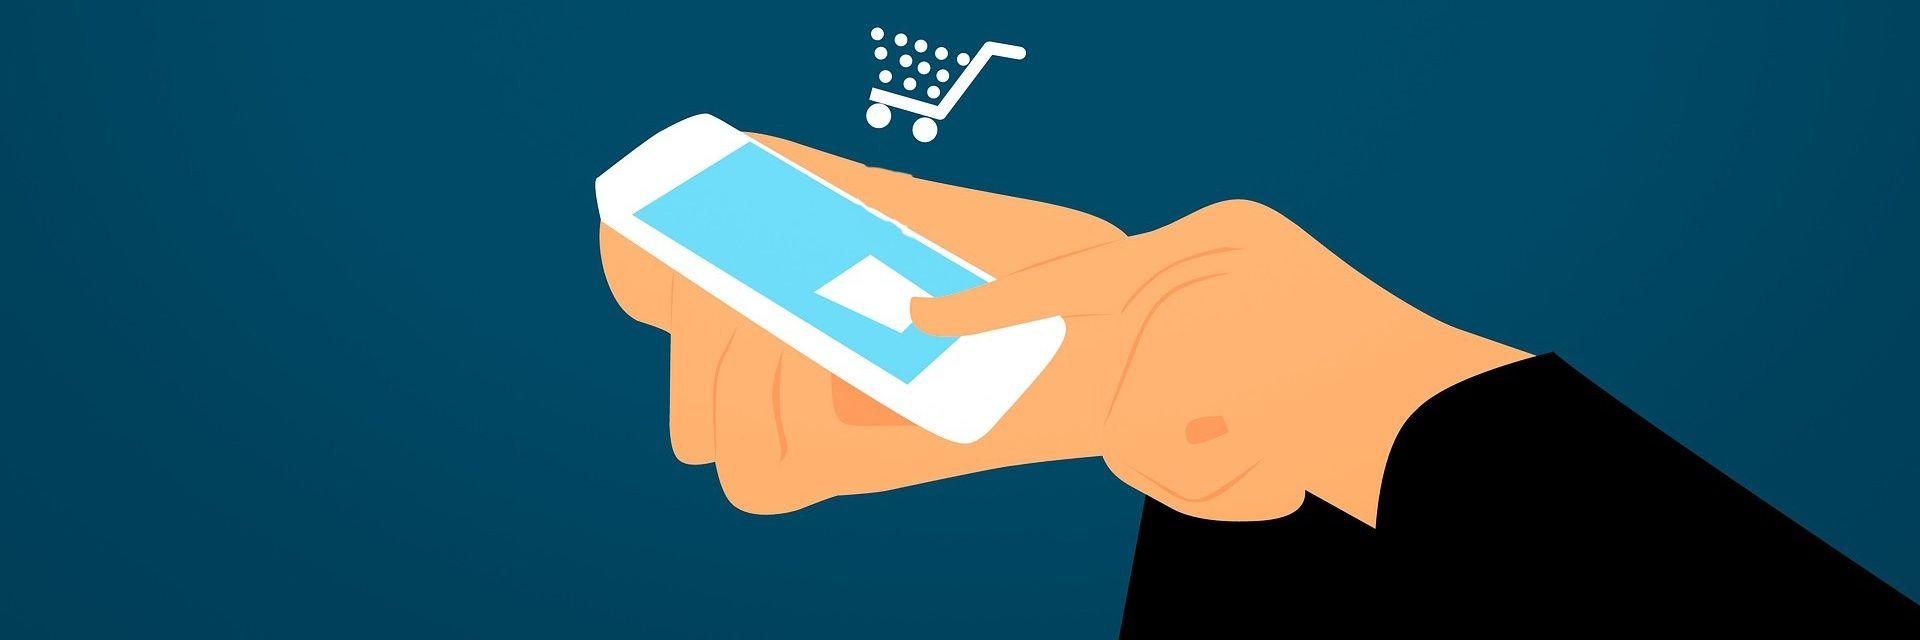 Ways to improve customer service and save money